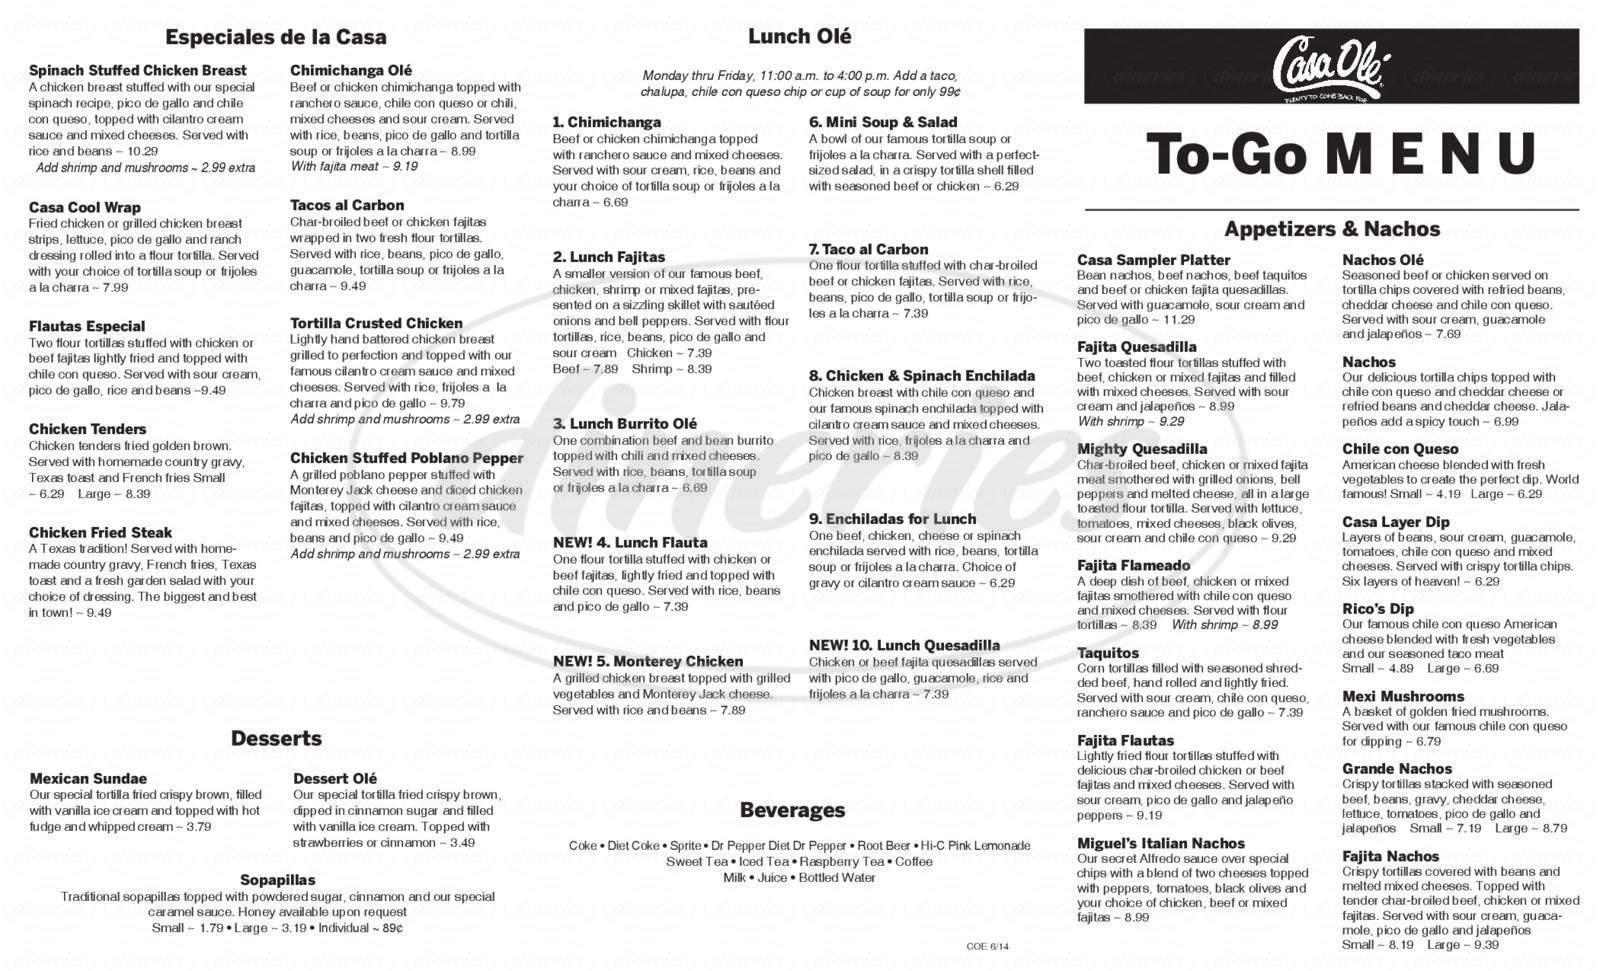 menu for Casa Olé